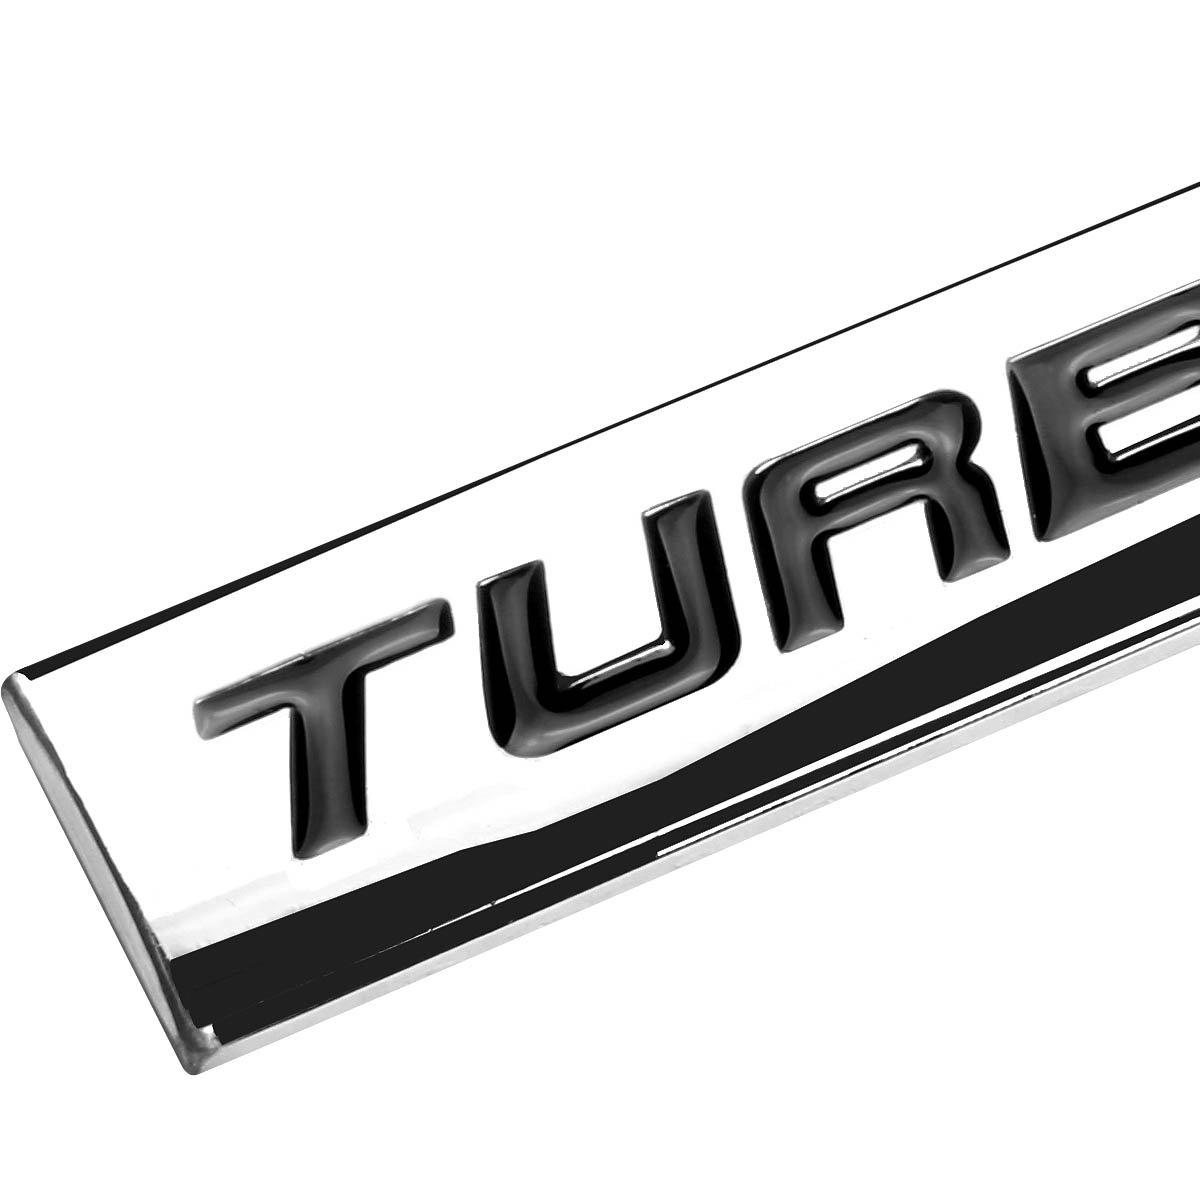 Chrome Finish Metal Emblem Turbocharged Badge (Black Letter)